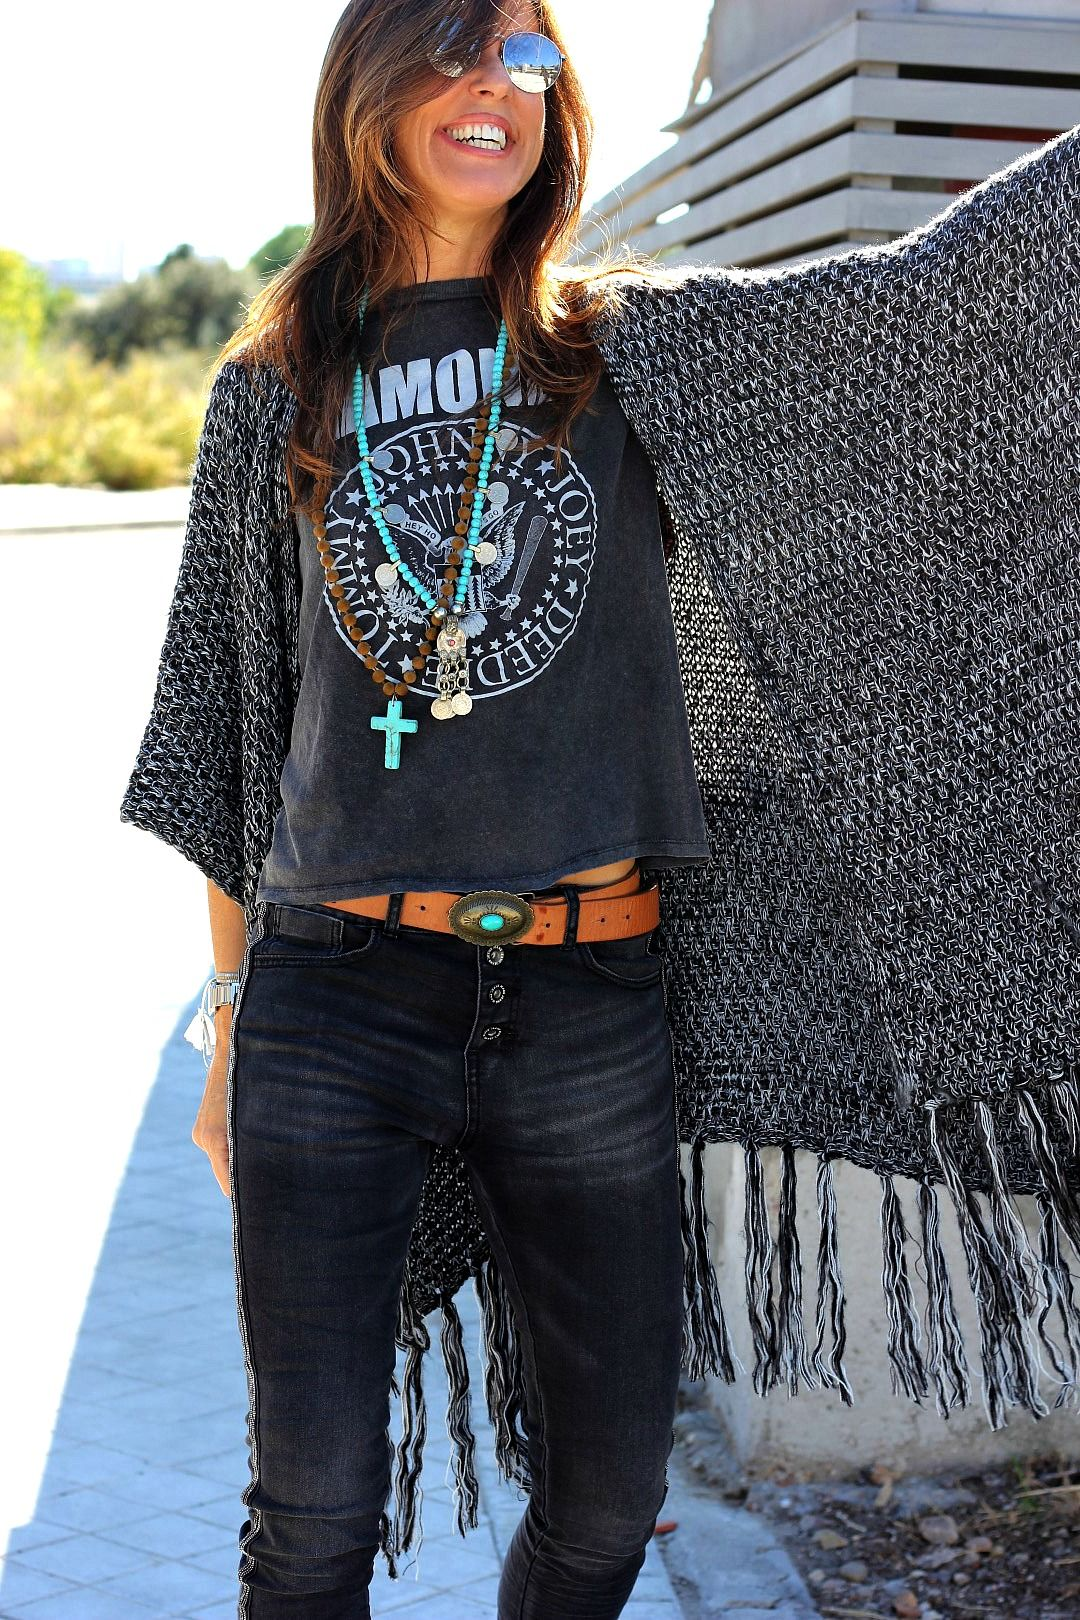 Mytenida Poncho Chiadu Terrace AquÍ Chaqueta Jacket Levard Camiseta T Shirt Pull Bear Jeans The Amity Company Bolso Handbag